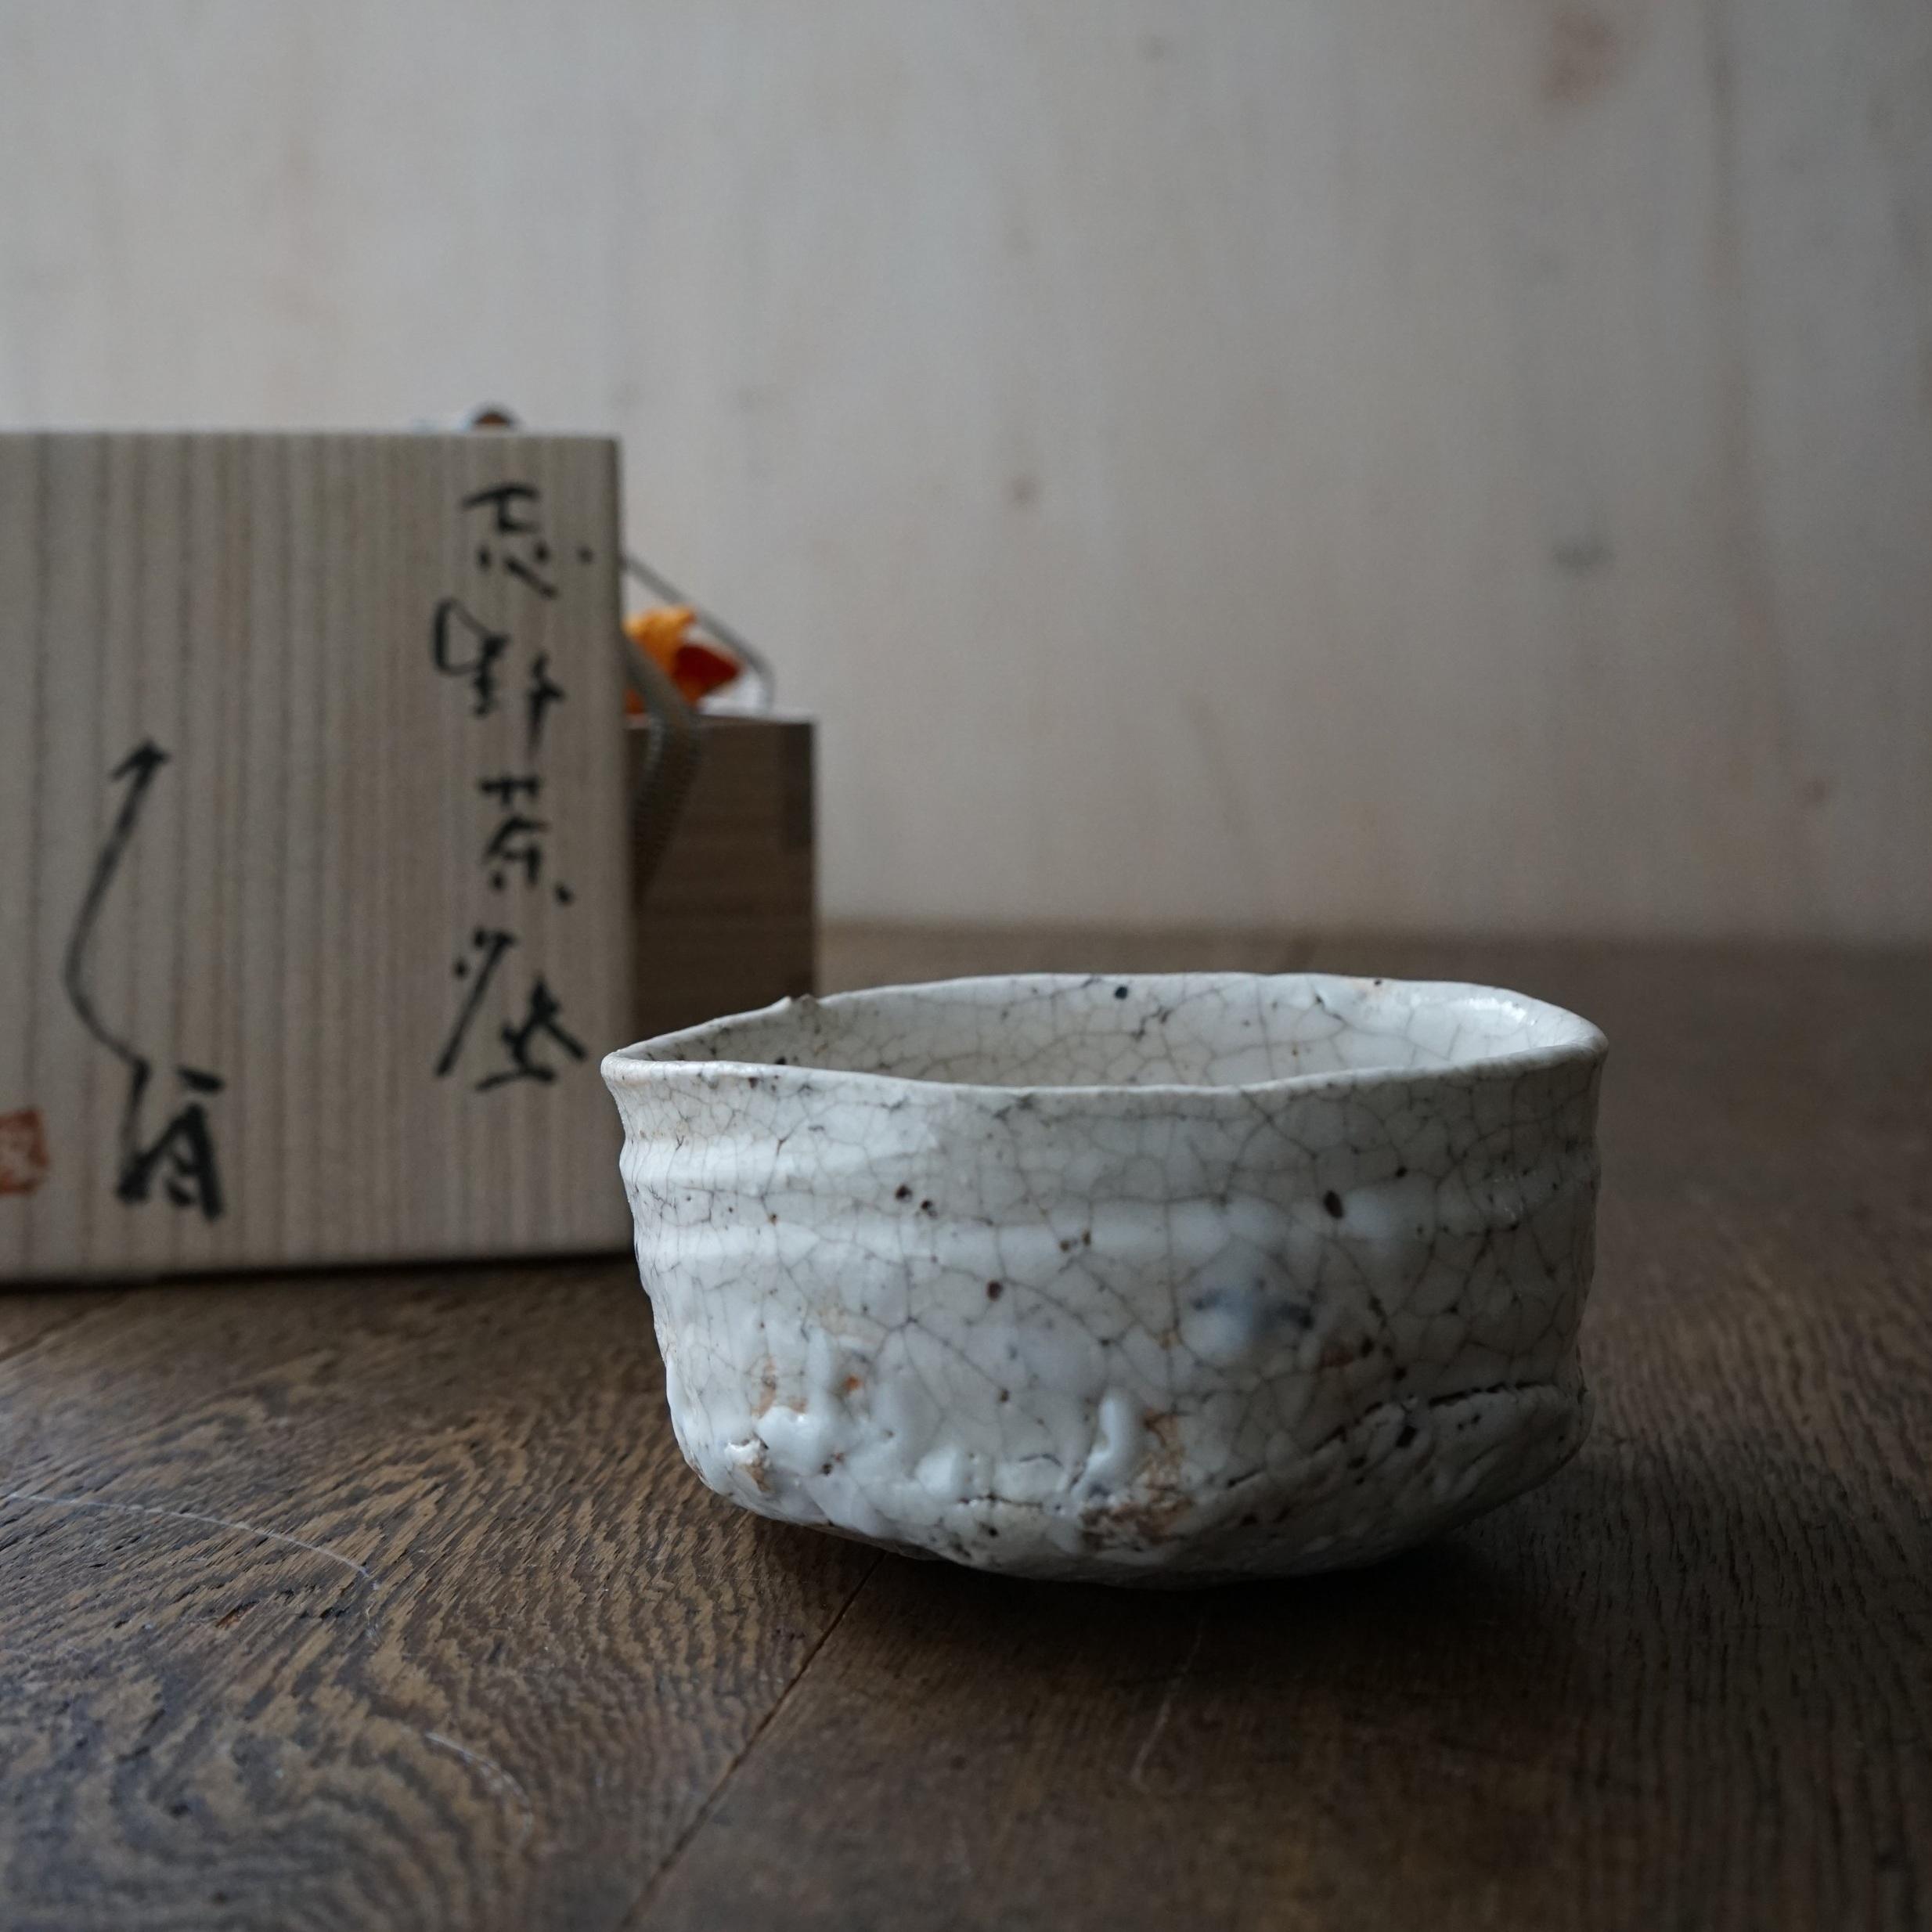 辻村史朗 志野茶碗 | Shino Chawan by Shiro Tsujimura